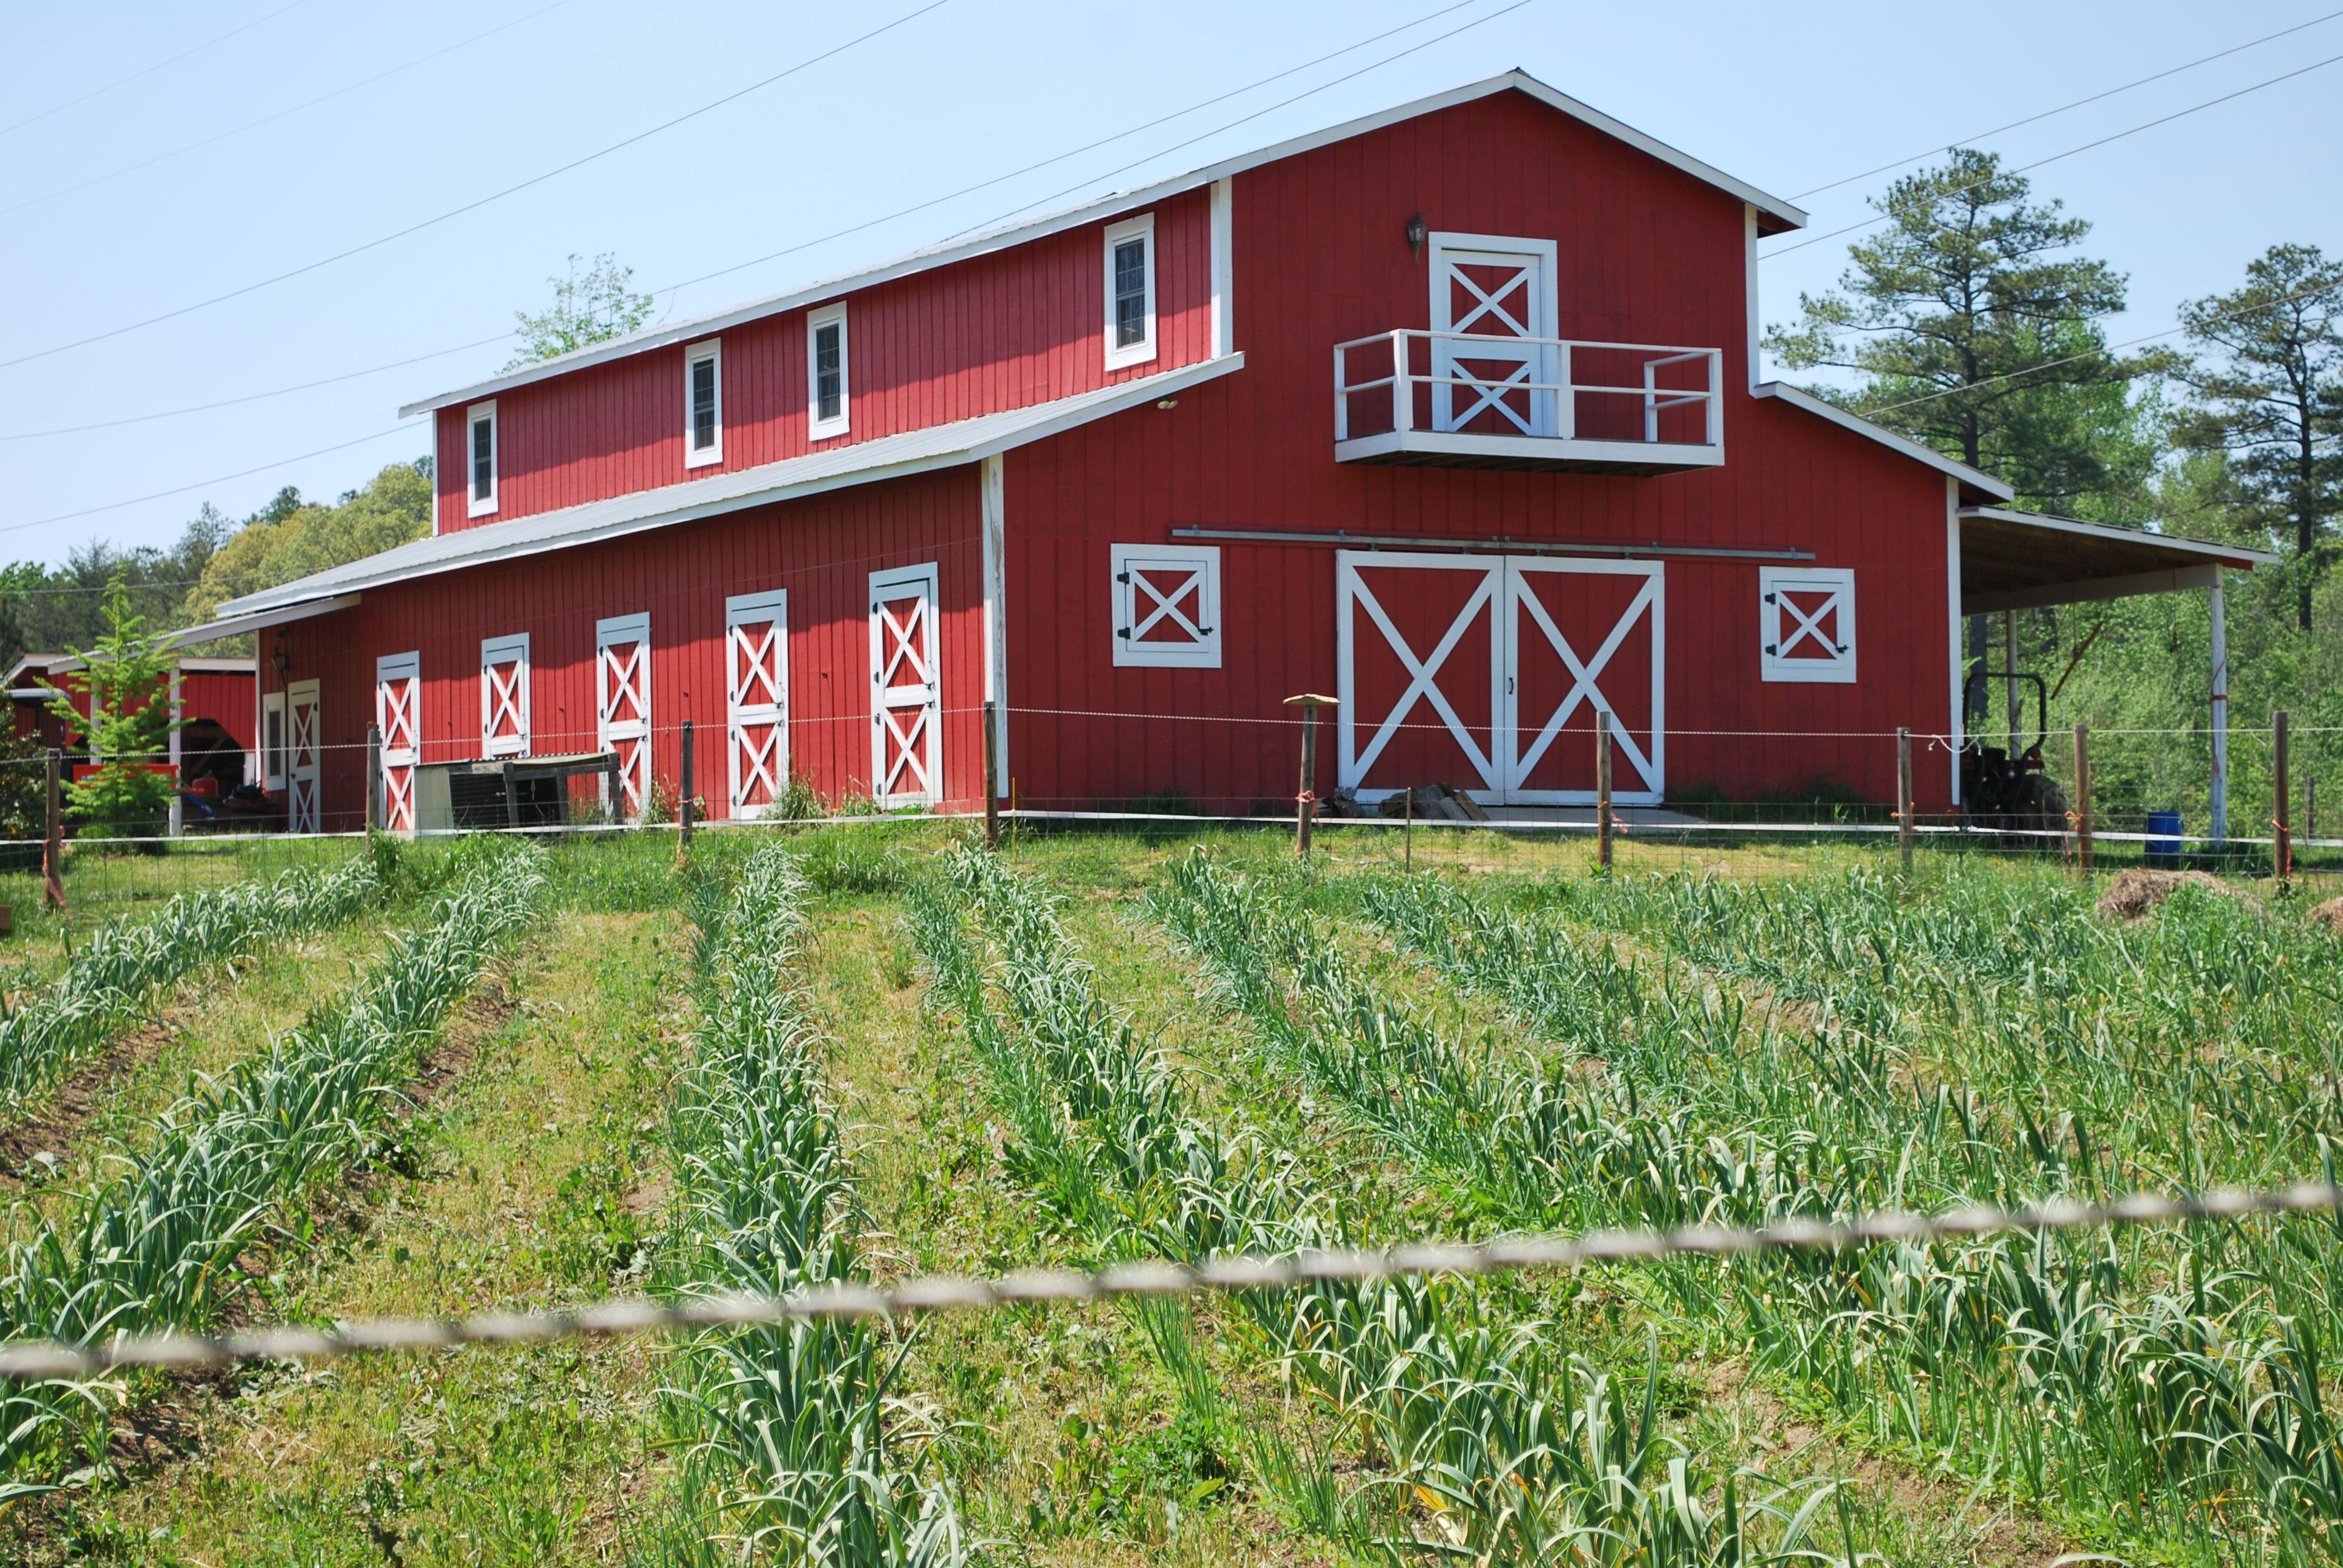 fickle creek farm s beautiful red barn and fields grow organic